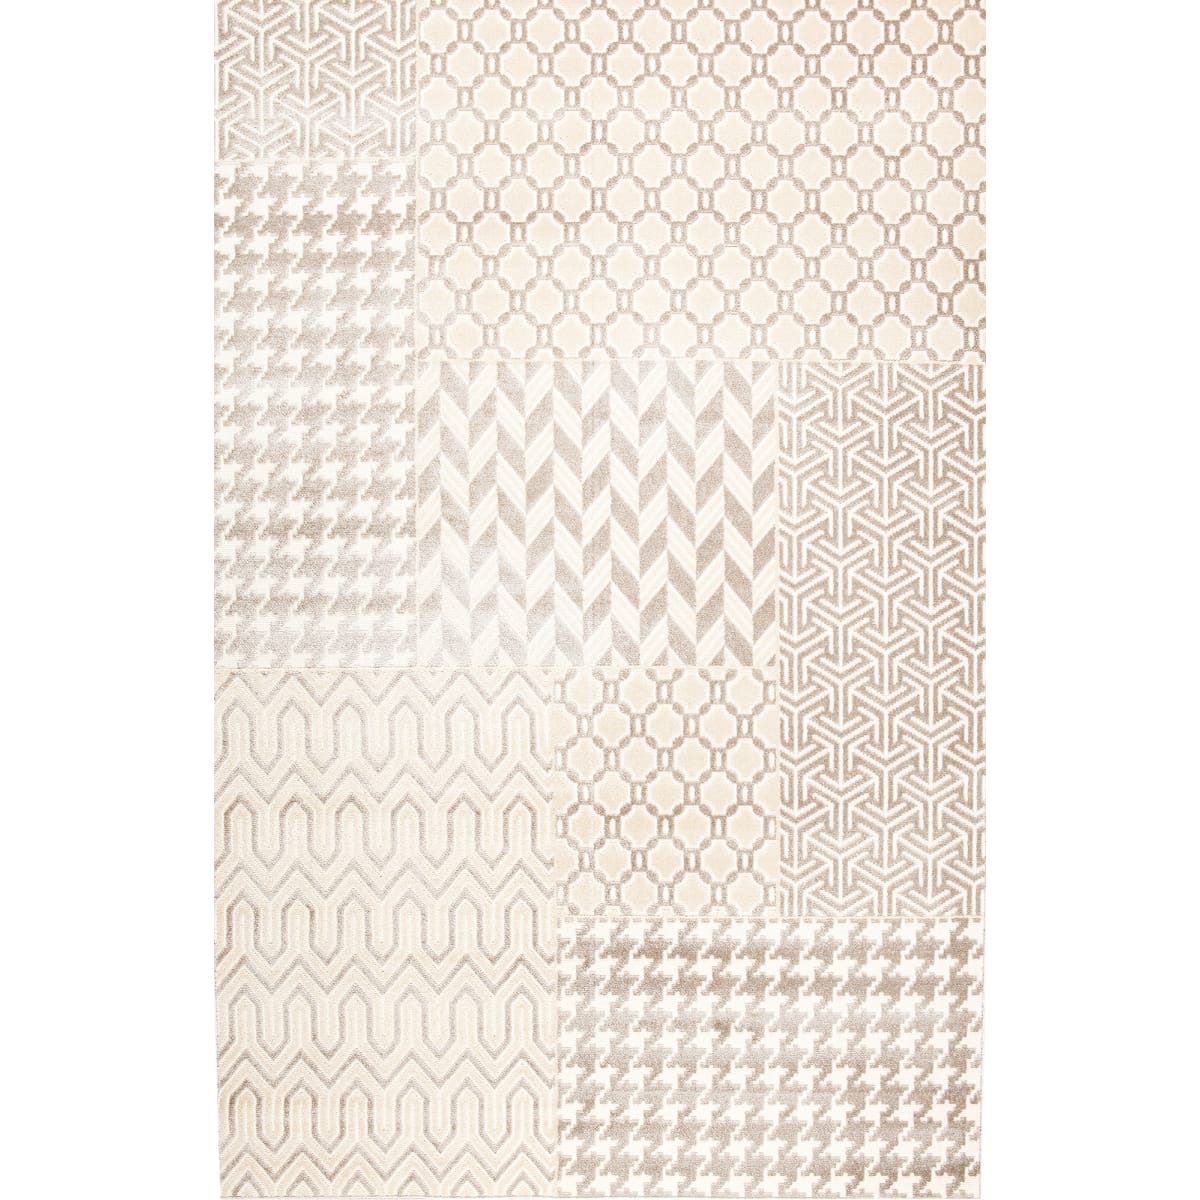 Ковёр Reflex 40151/67, 1.2х1.7 м, цвет серый